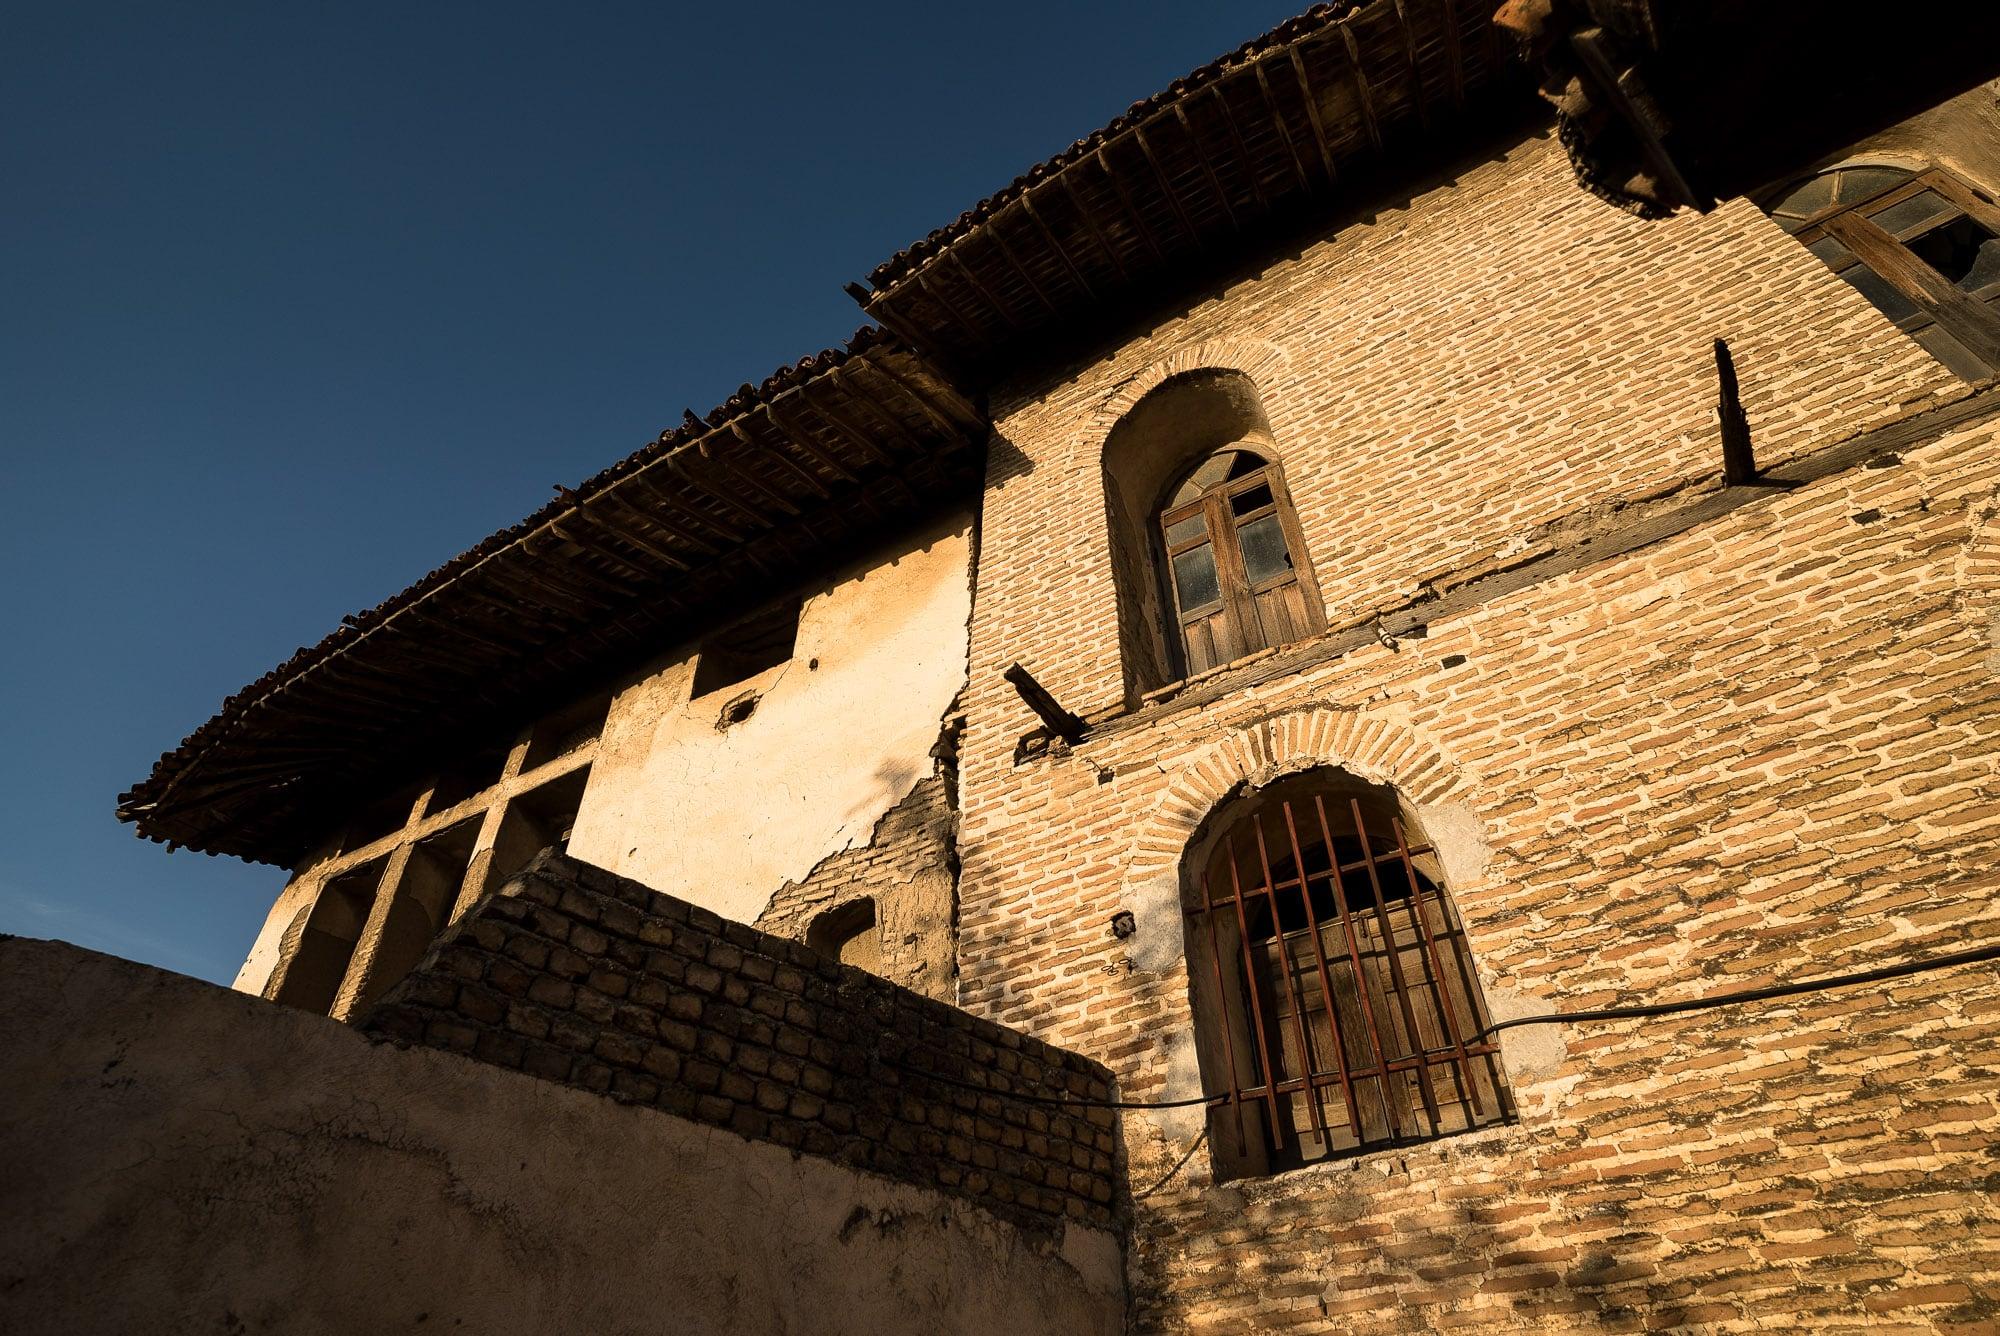 old building in Gorgan